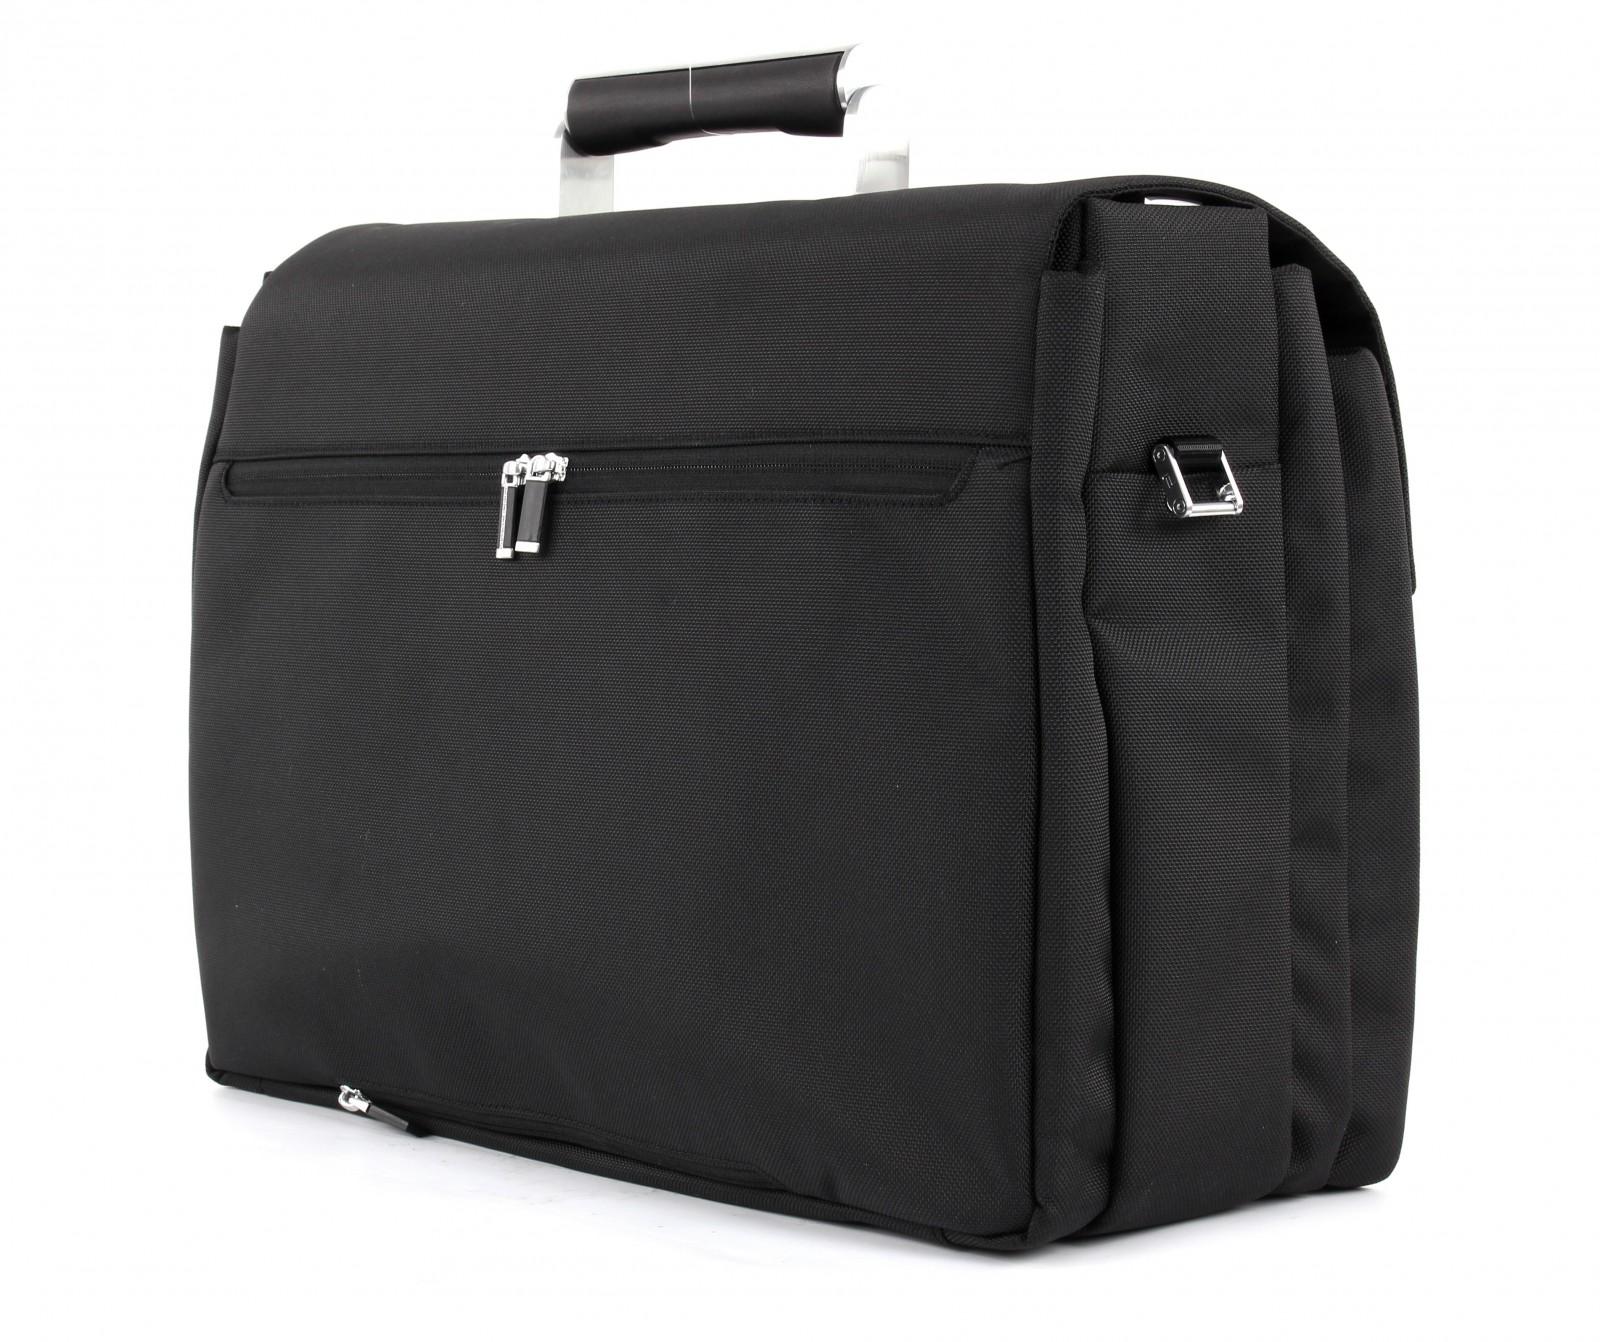 porsche design roadster 3 0 briefbag fm tasche aktentasche. Black Bedroom Furniture Sets. Home Design Ideas